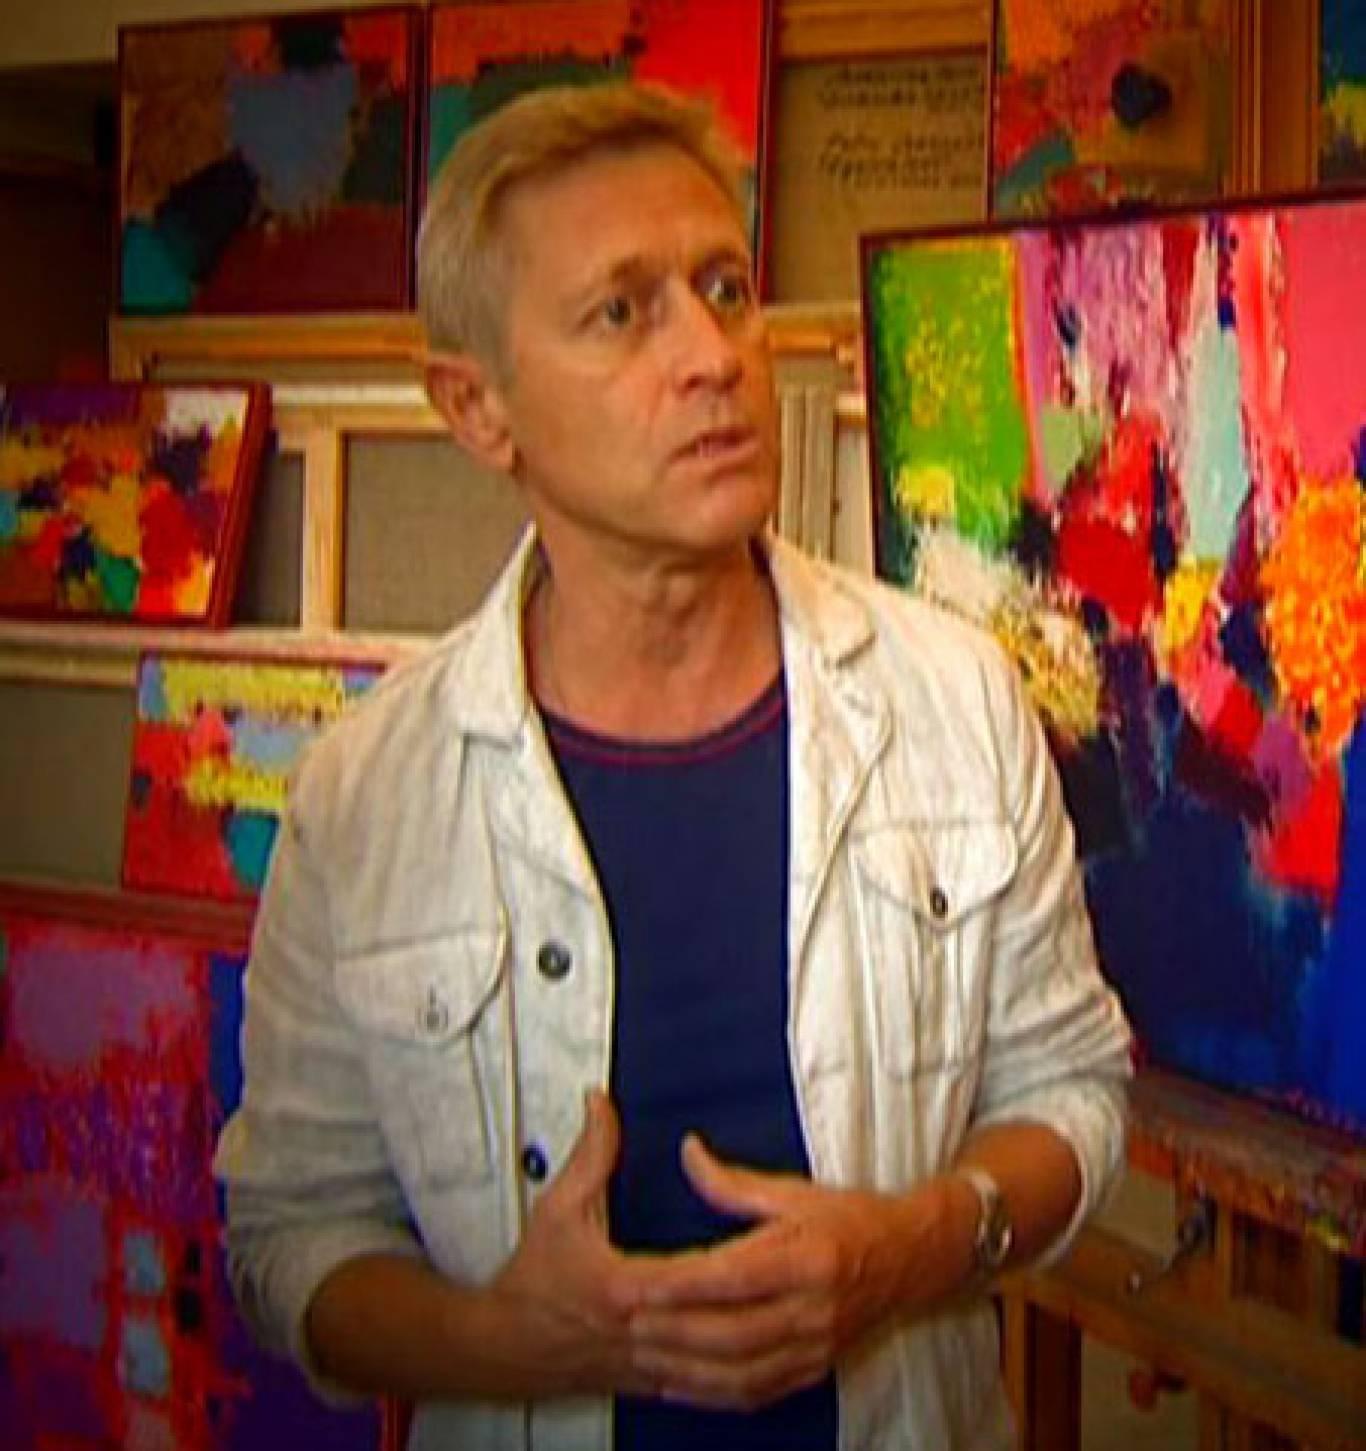 Виставка картин художника Петра Лебединця в «Kalivoshko & Shubina Gallery»